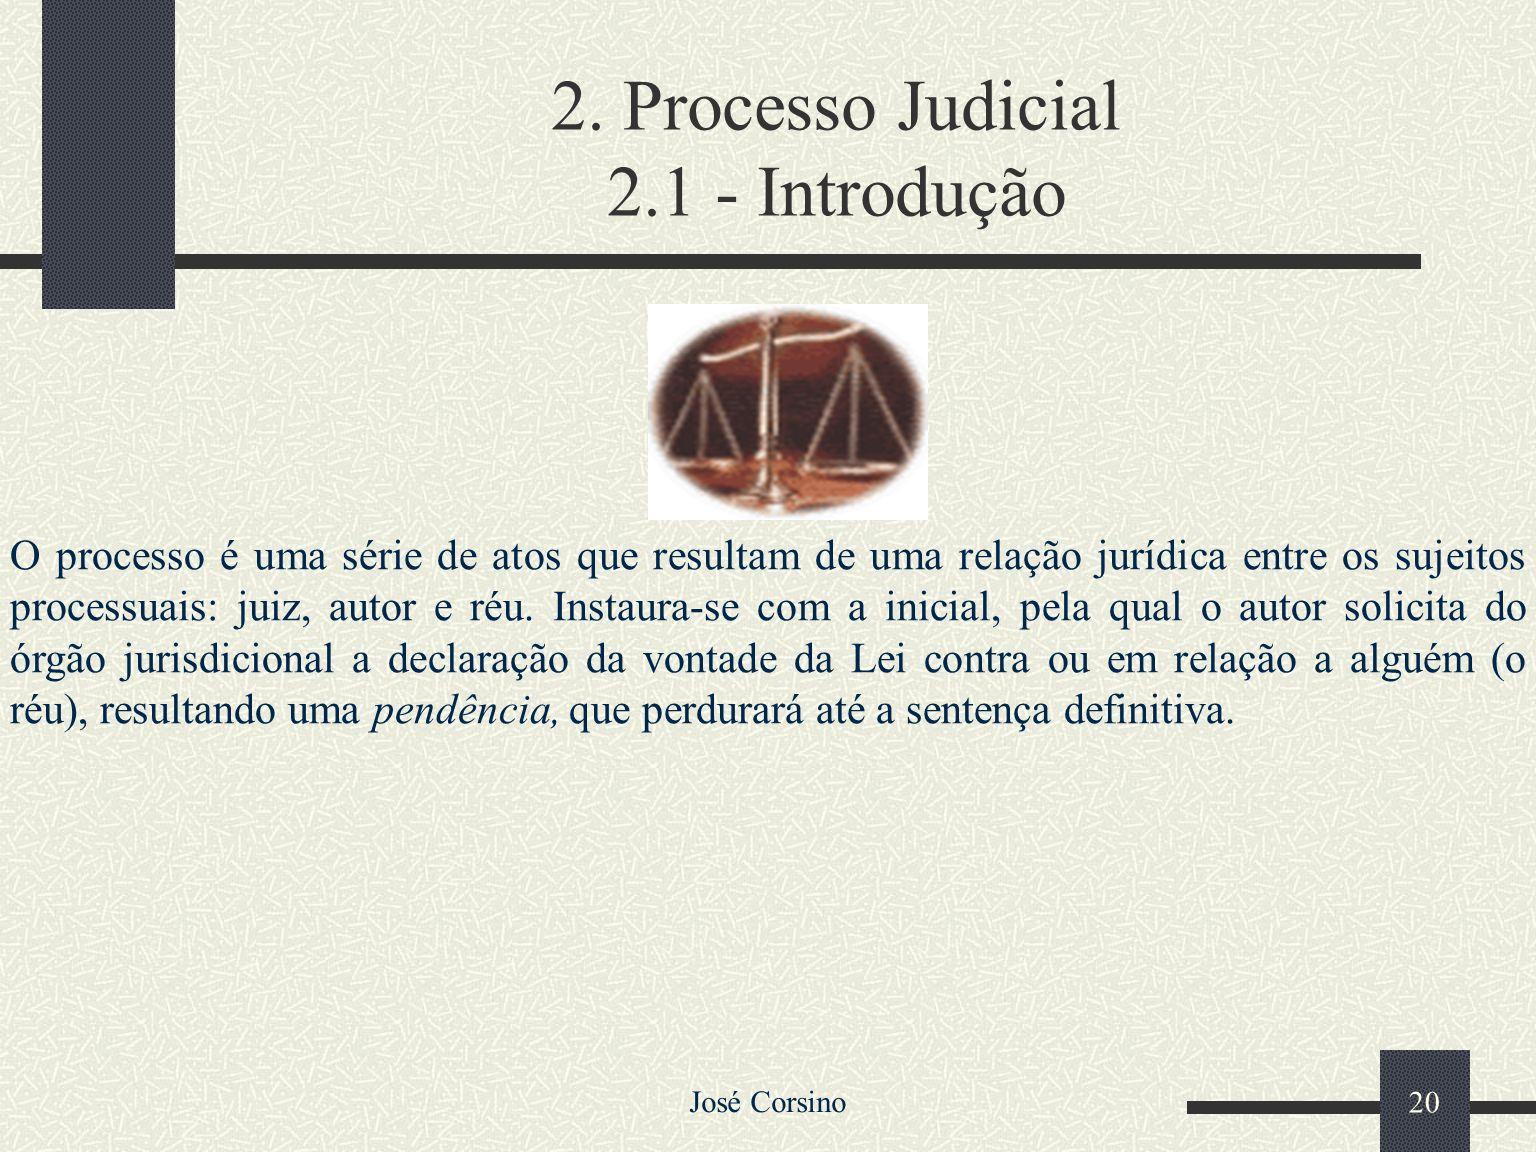 José Corsino 19 JUSTIÇA ESTADUAL Comum 1ª INSTÂNCIA2ª INSTÂNCIA Tribunal de Justiça do Estado Desembargadores Comarcas de 1ª, 2ª e 3ª Entrância Comarc